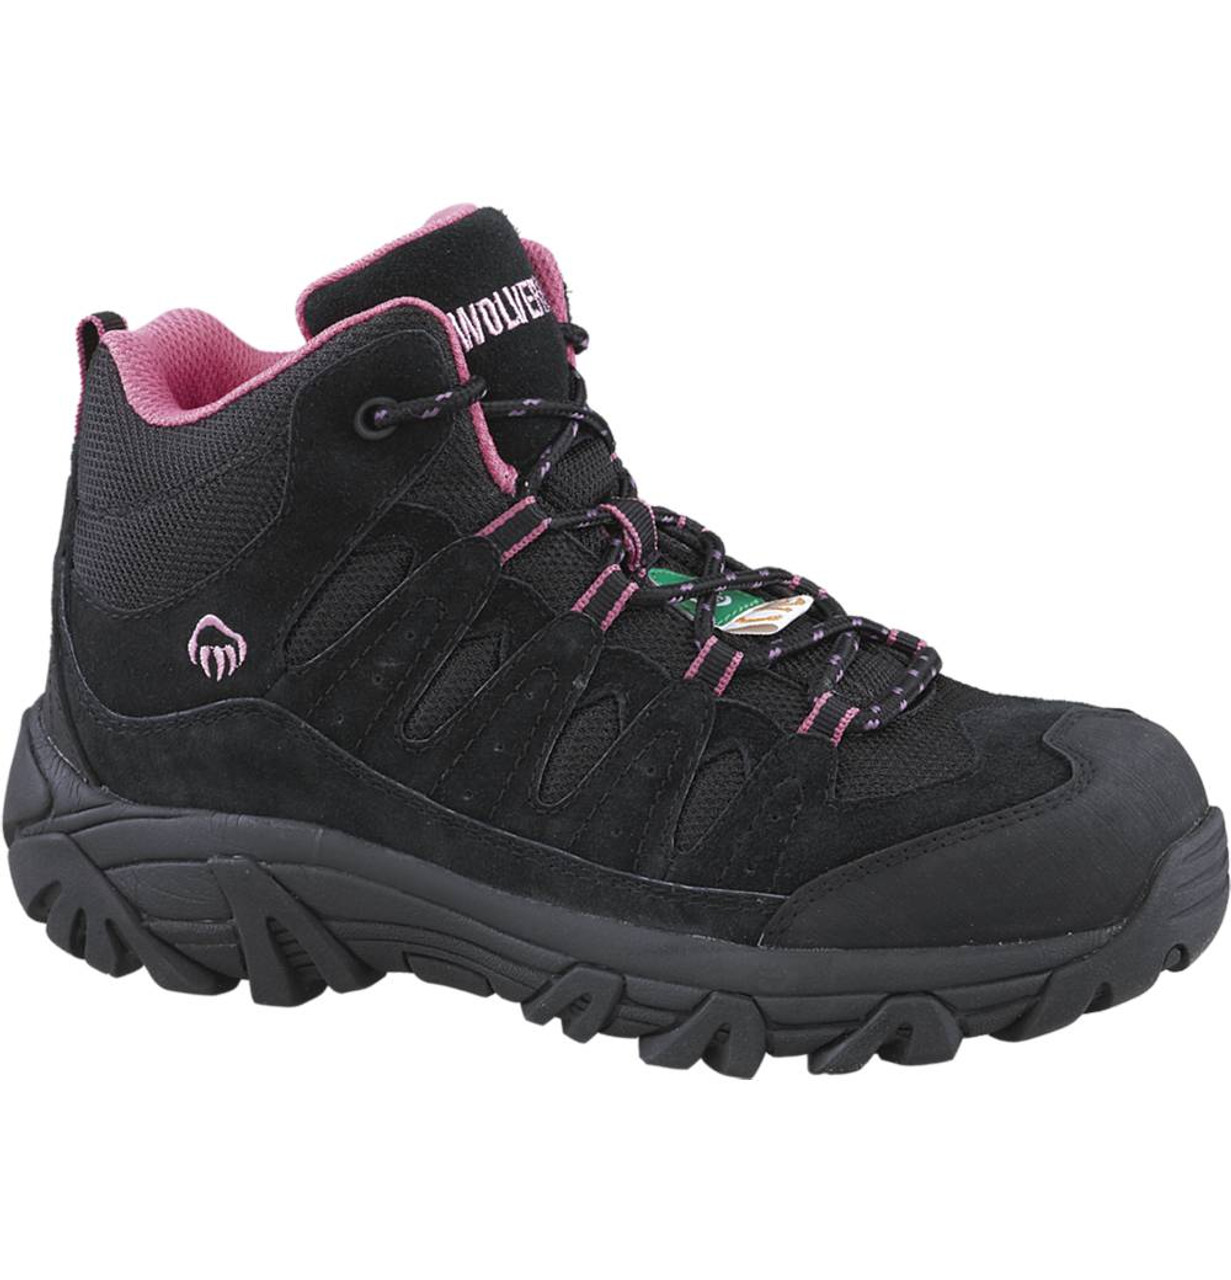 ecaf933a6aa Women's Wolverine Outlook HI Saftey Boot